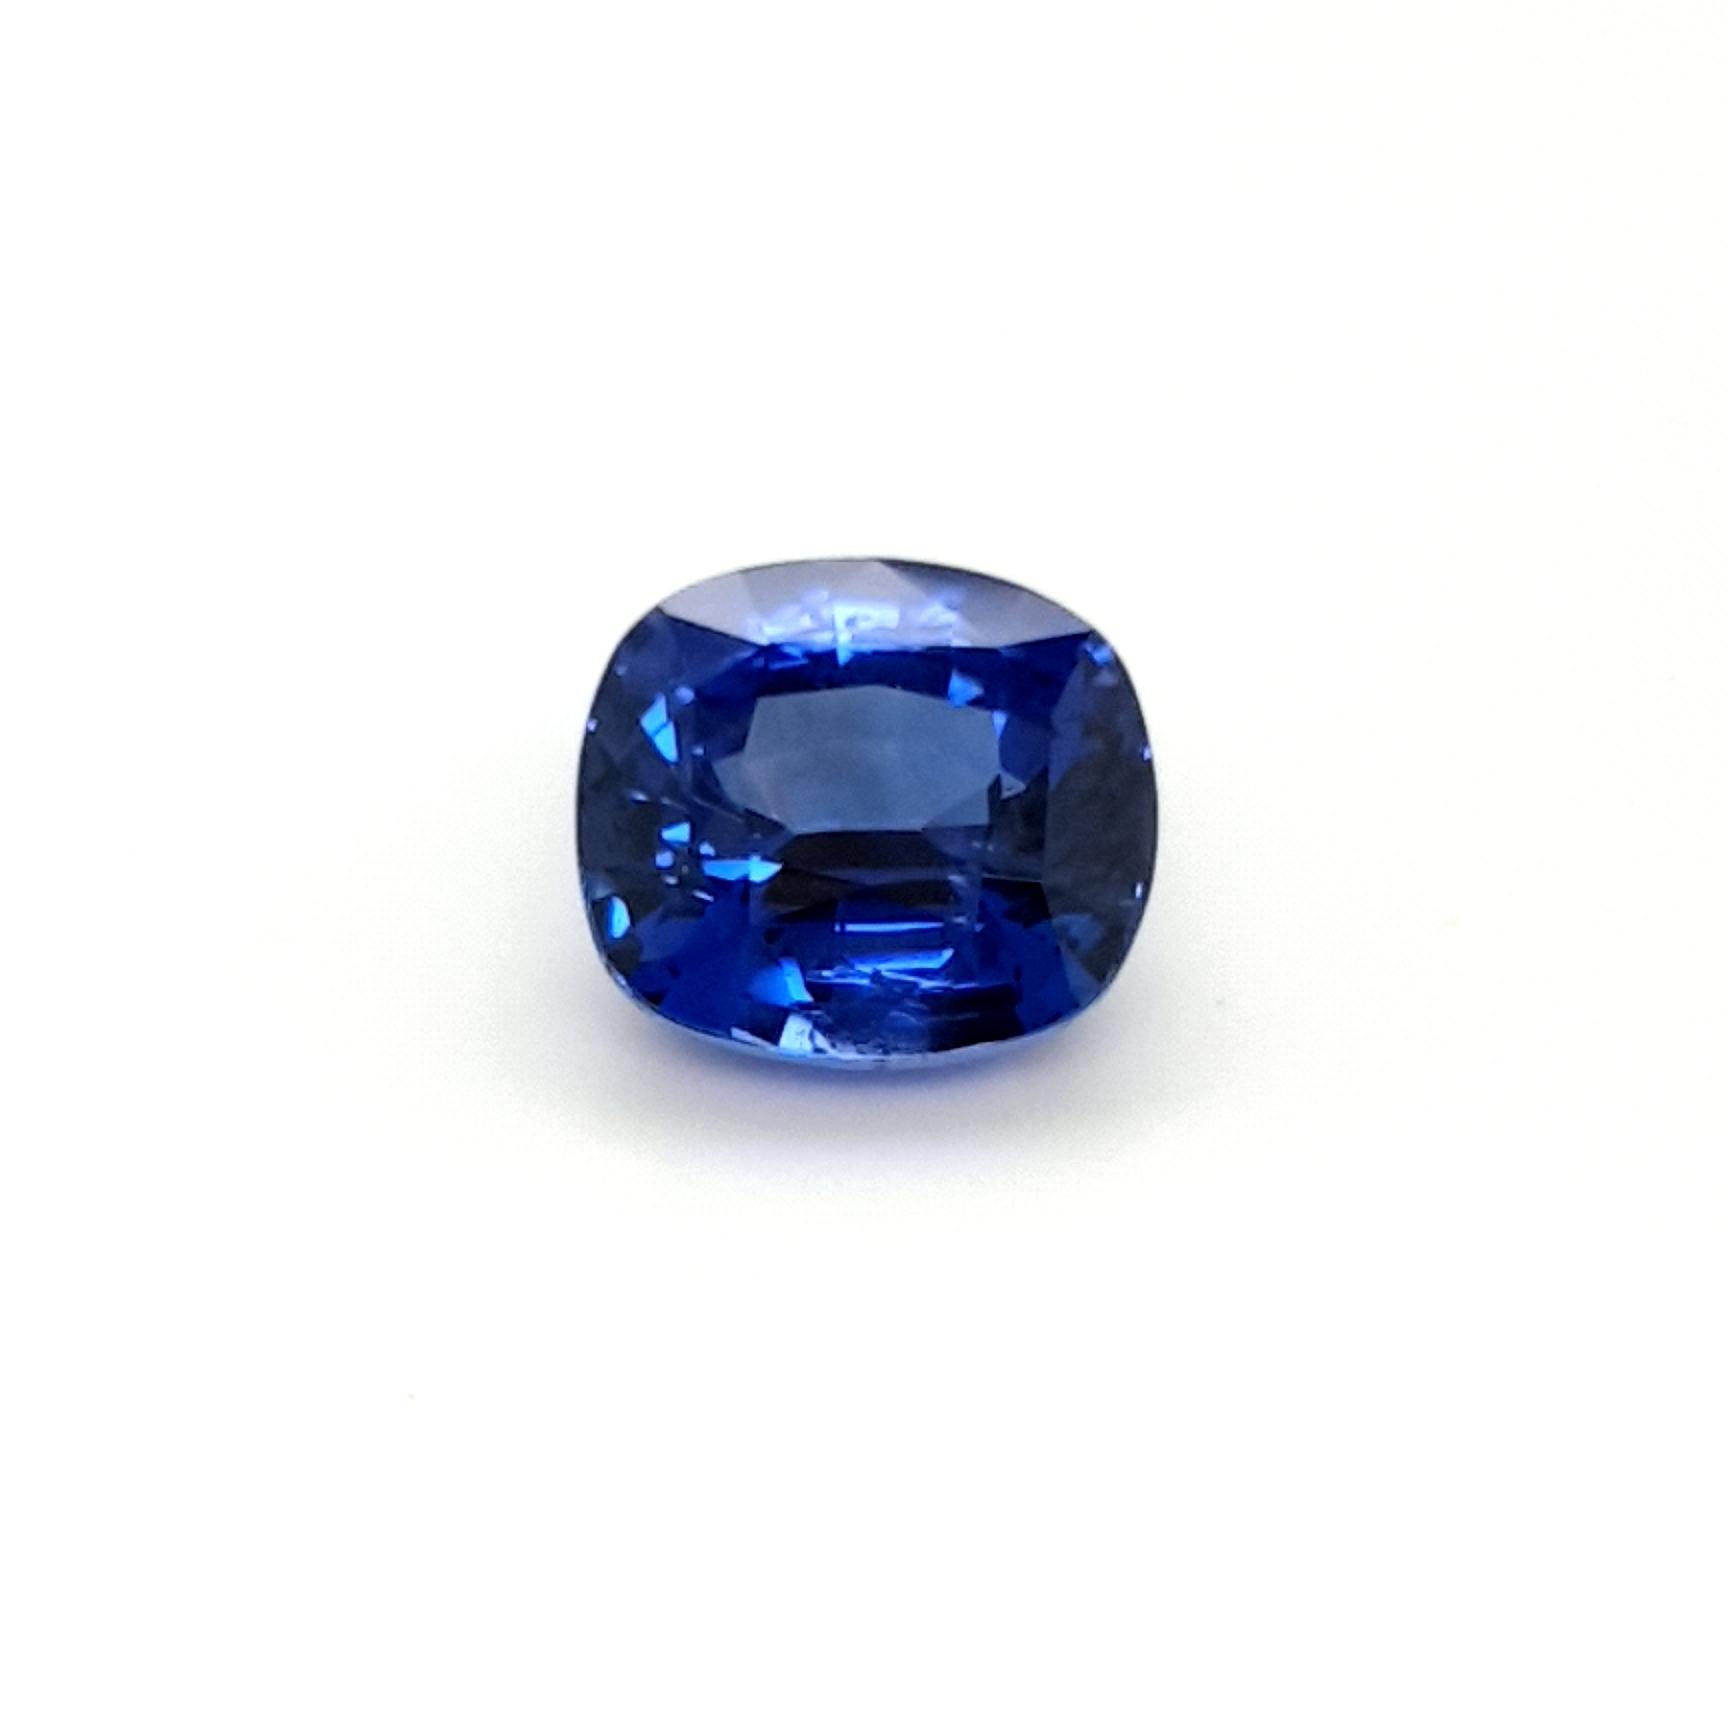 5,55ct. Sapphire Ceylon cert. SAD15D3 ClaudiaHamann__2021-06-02-18-40-31